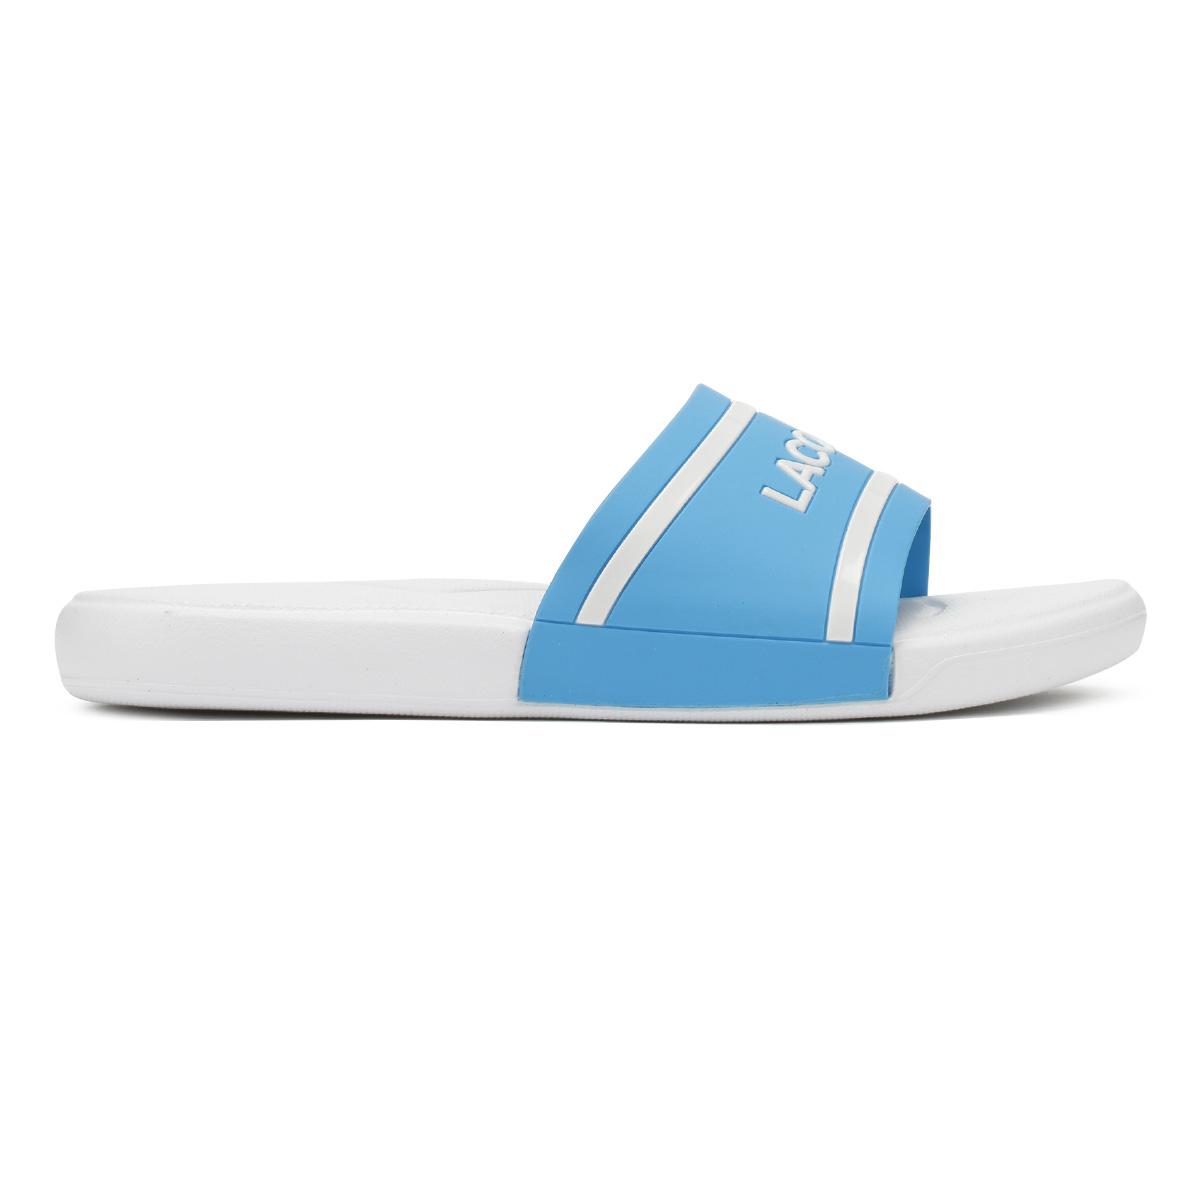 94a5defef Lacoste Junior Blue   White L.30 118 2 Slides Kids Casual Summer Beach Shoes